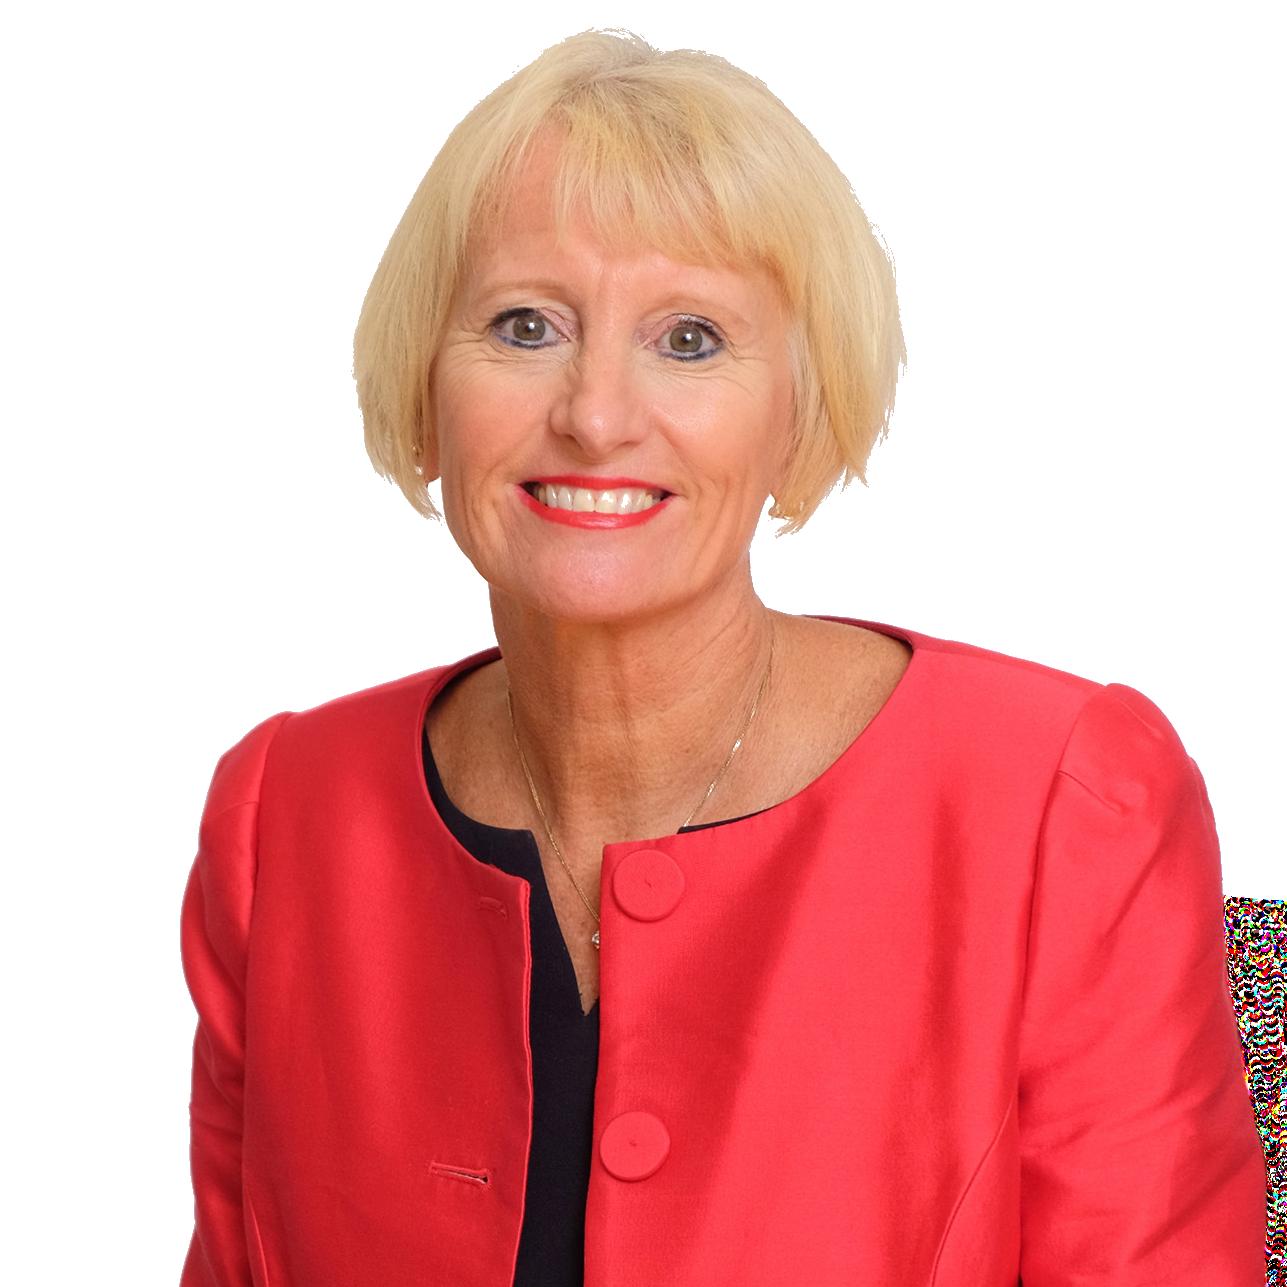 Caroline Prow - Managing Director, Equiom Guernsey